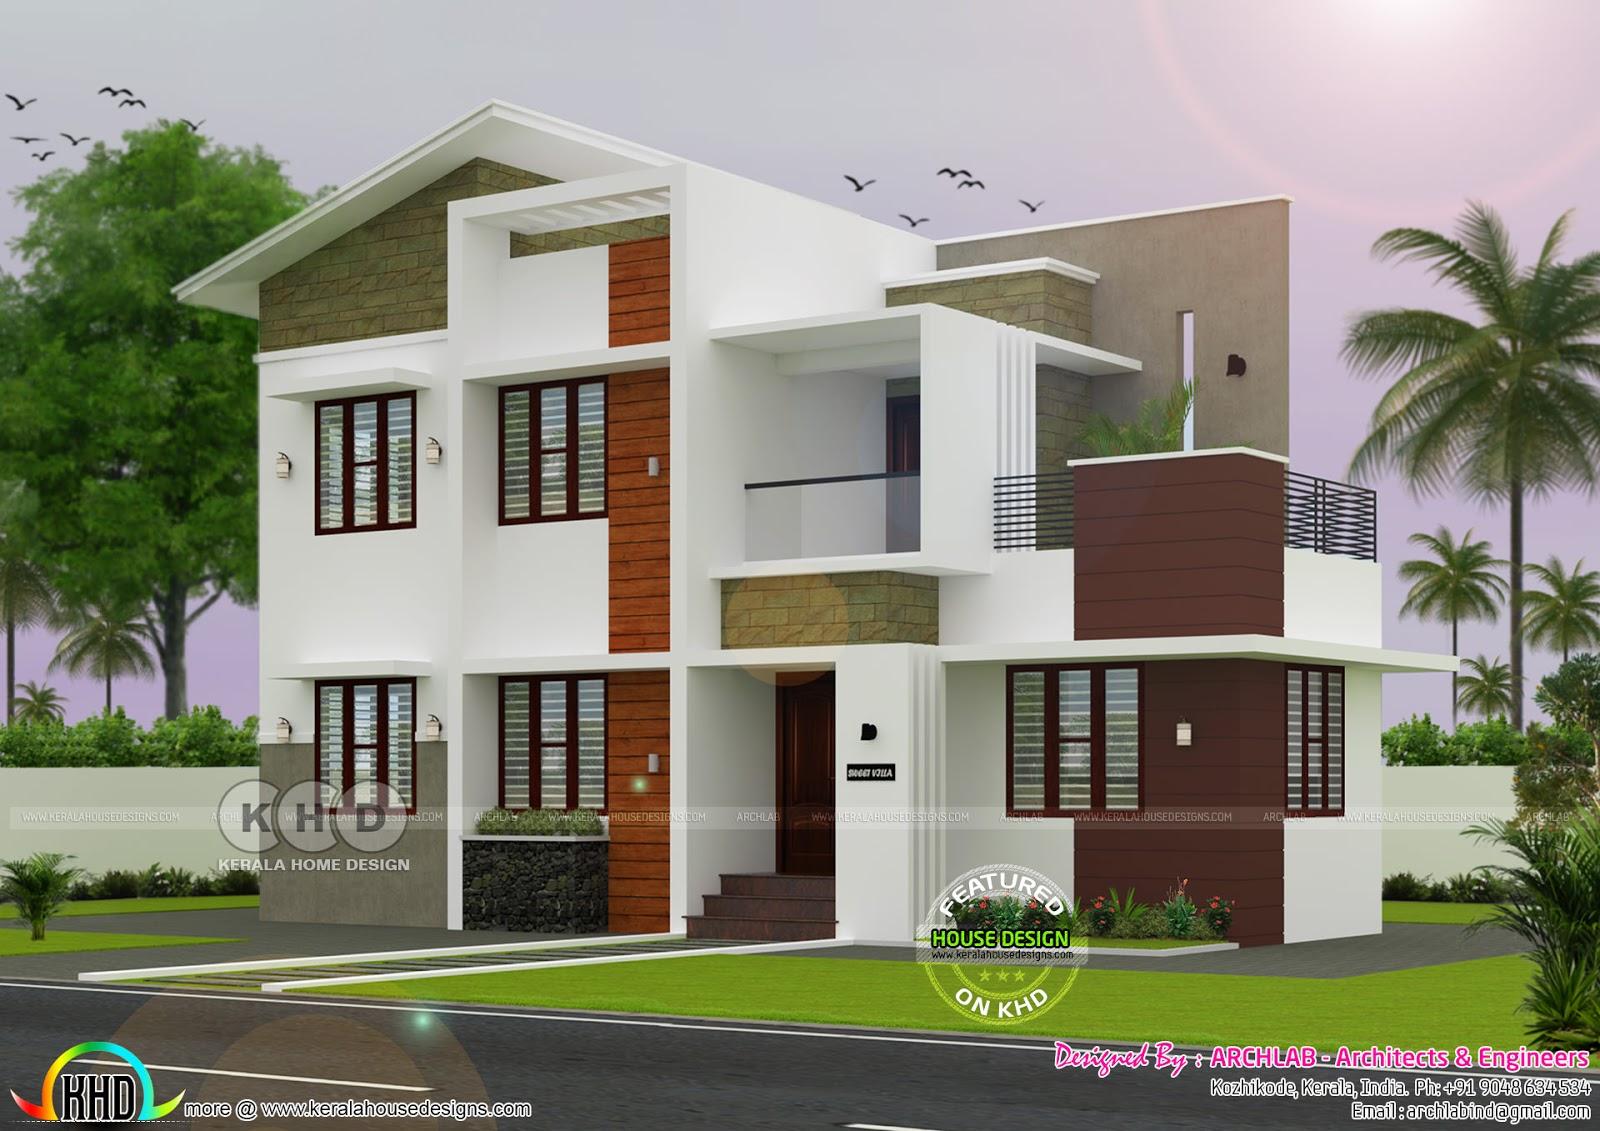 25 30 Lakhs Cost Estimated House Architecture Kerala